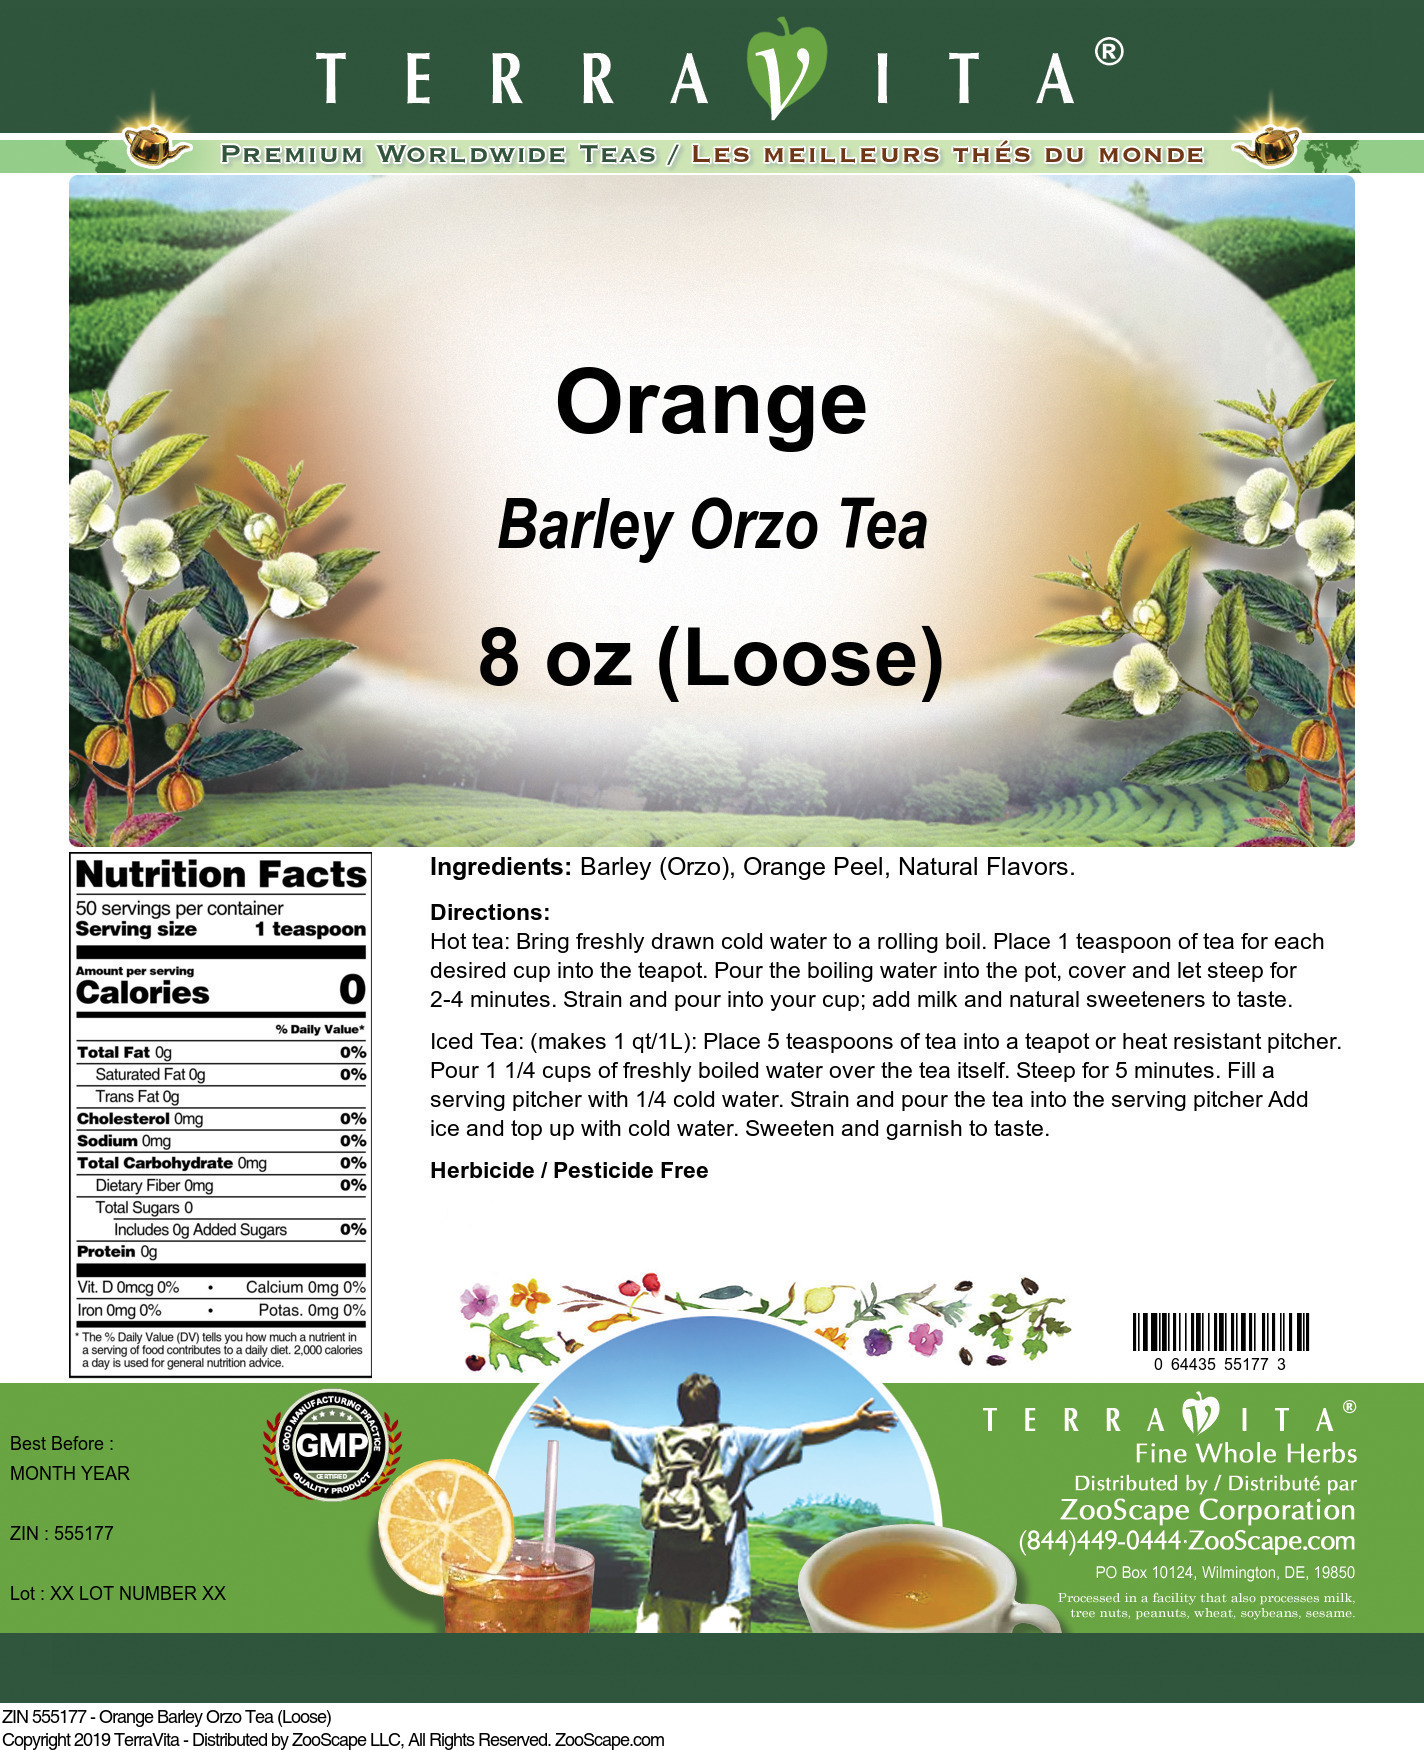 Orange Barley Orzo